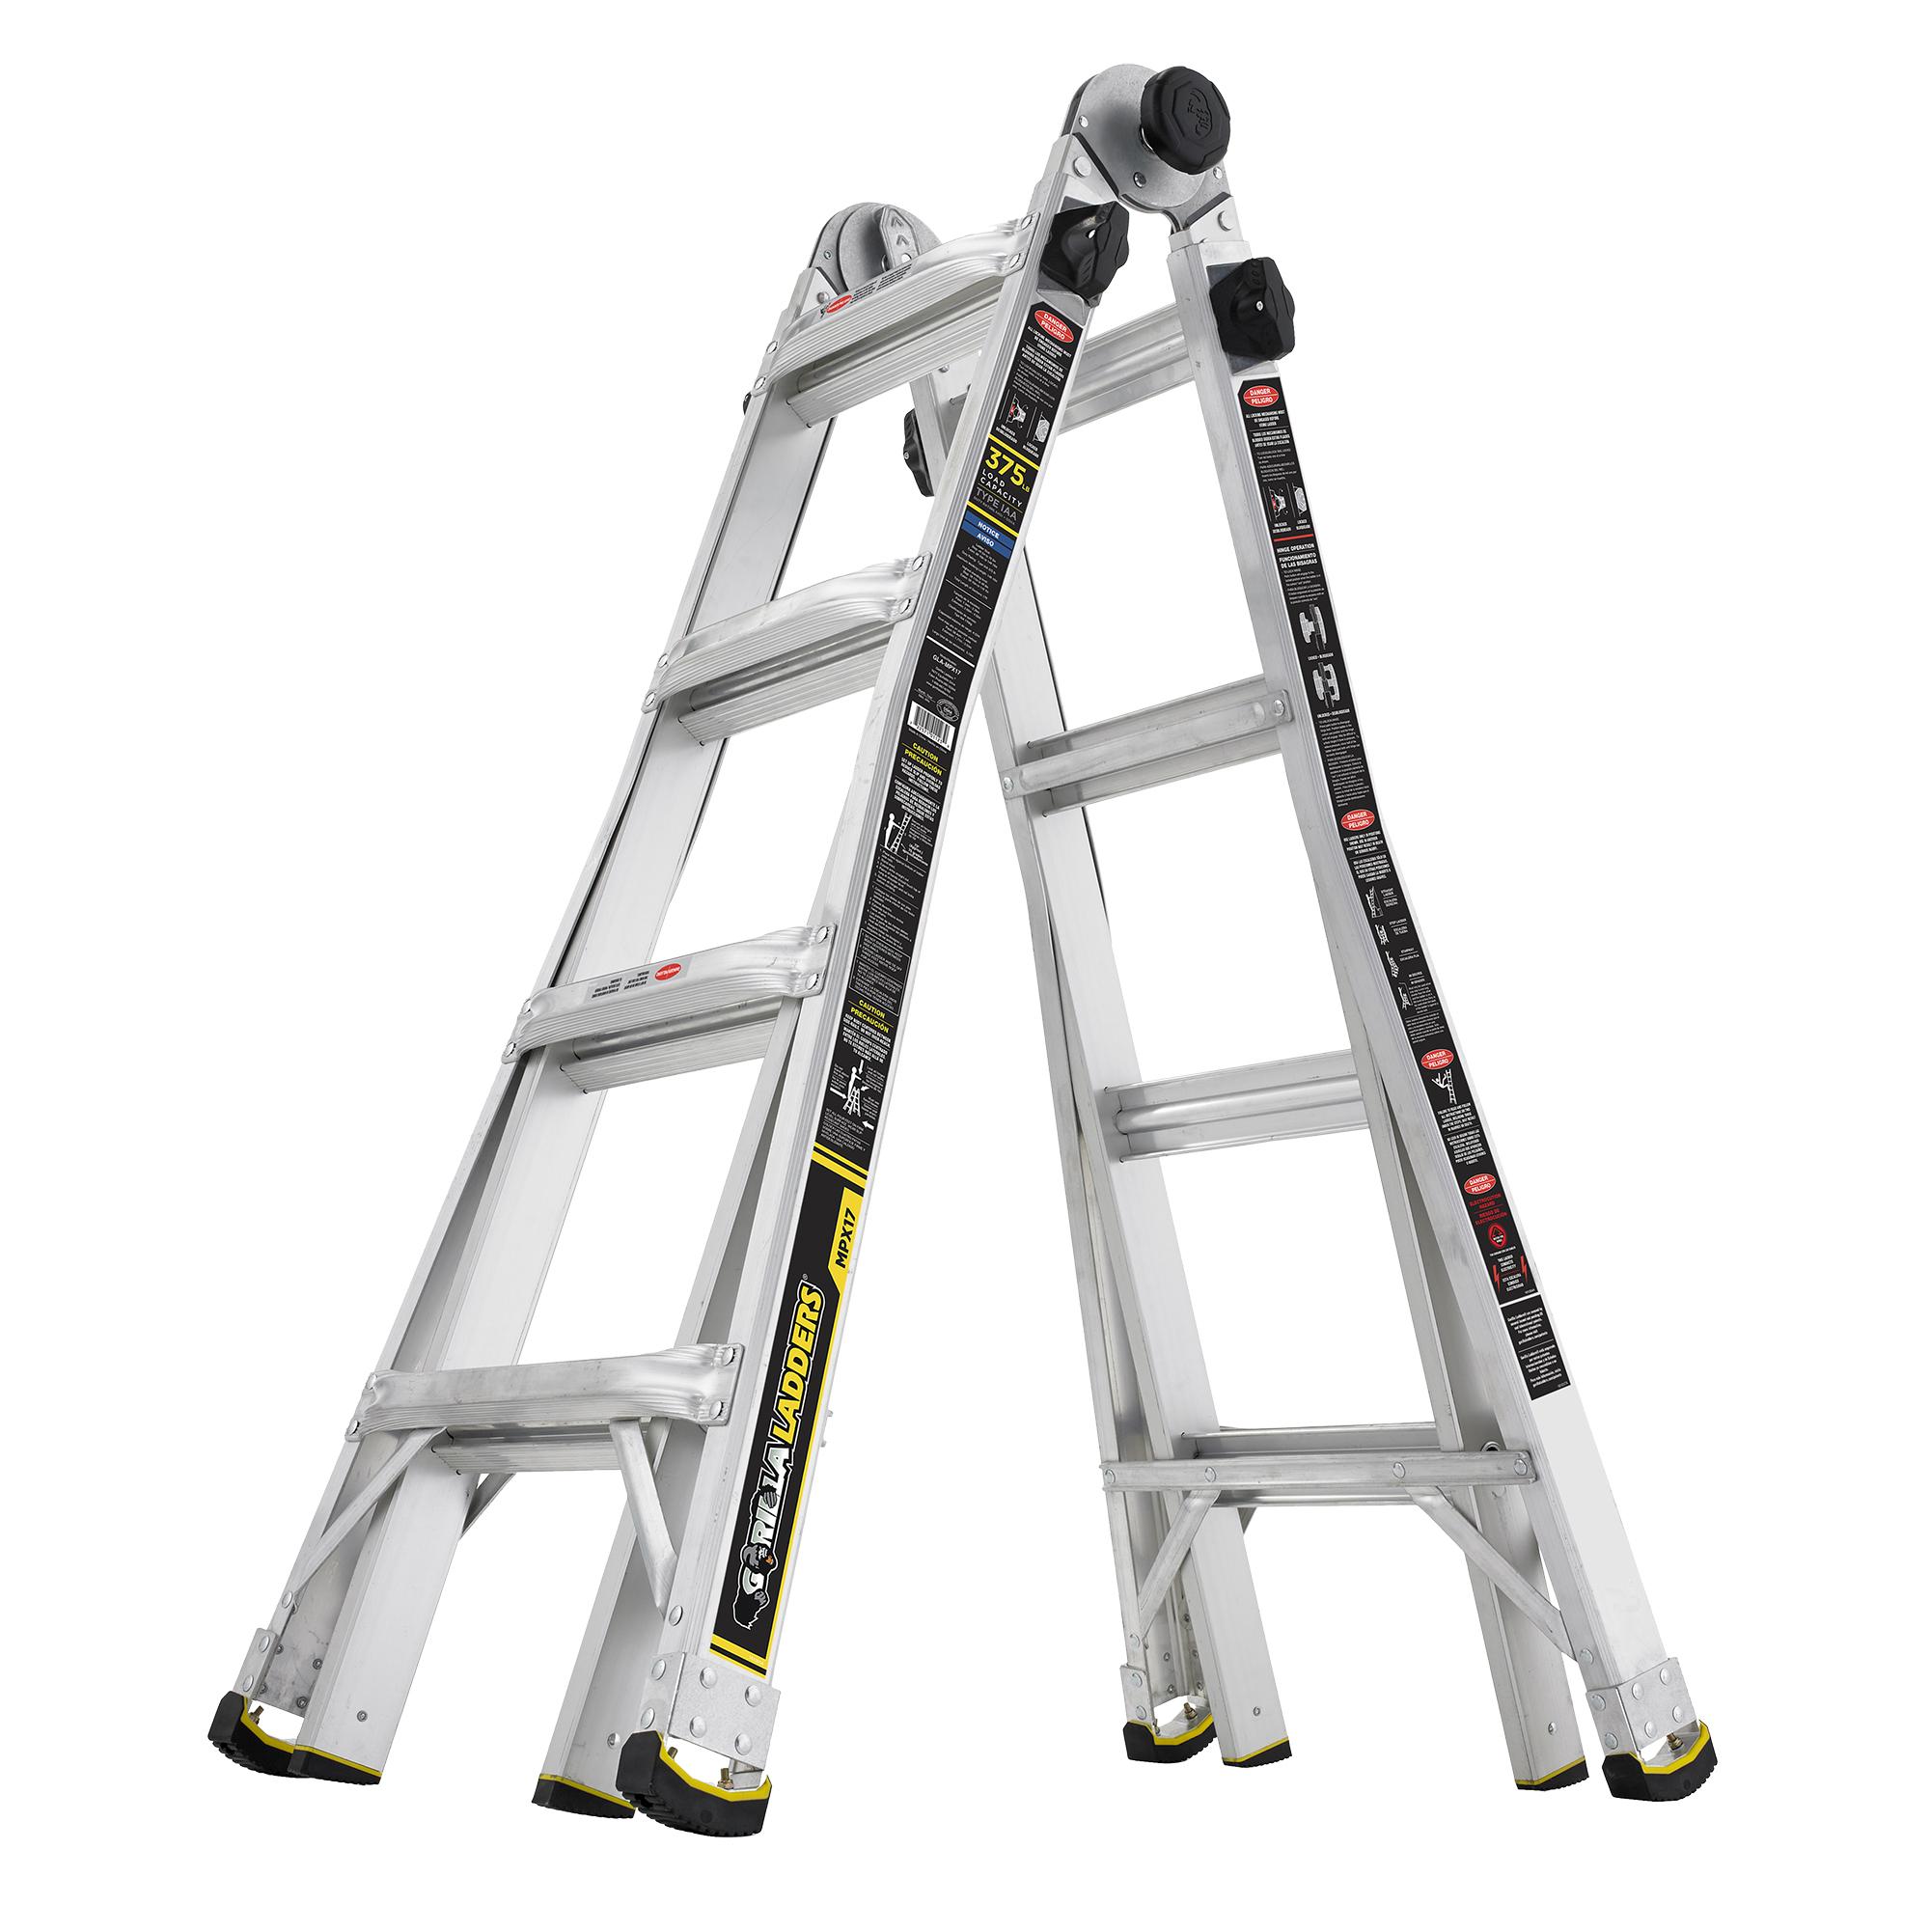 Gorilla LaddersGLMPX-17 / GLA-MPX17 - Gorilla Ladders